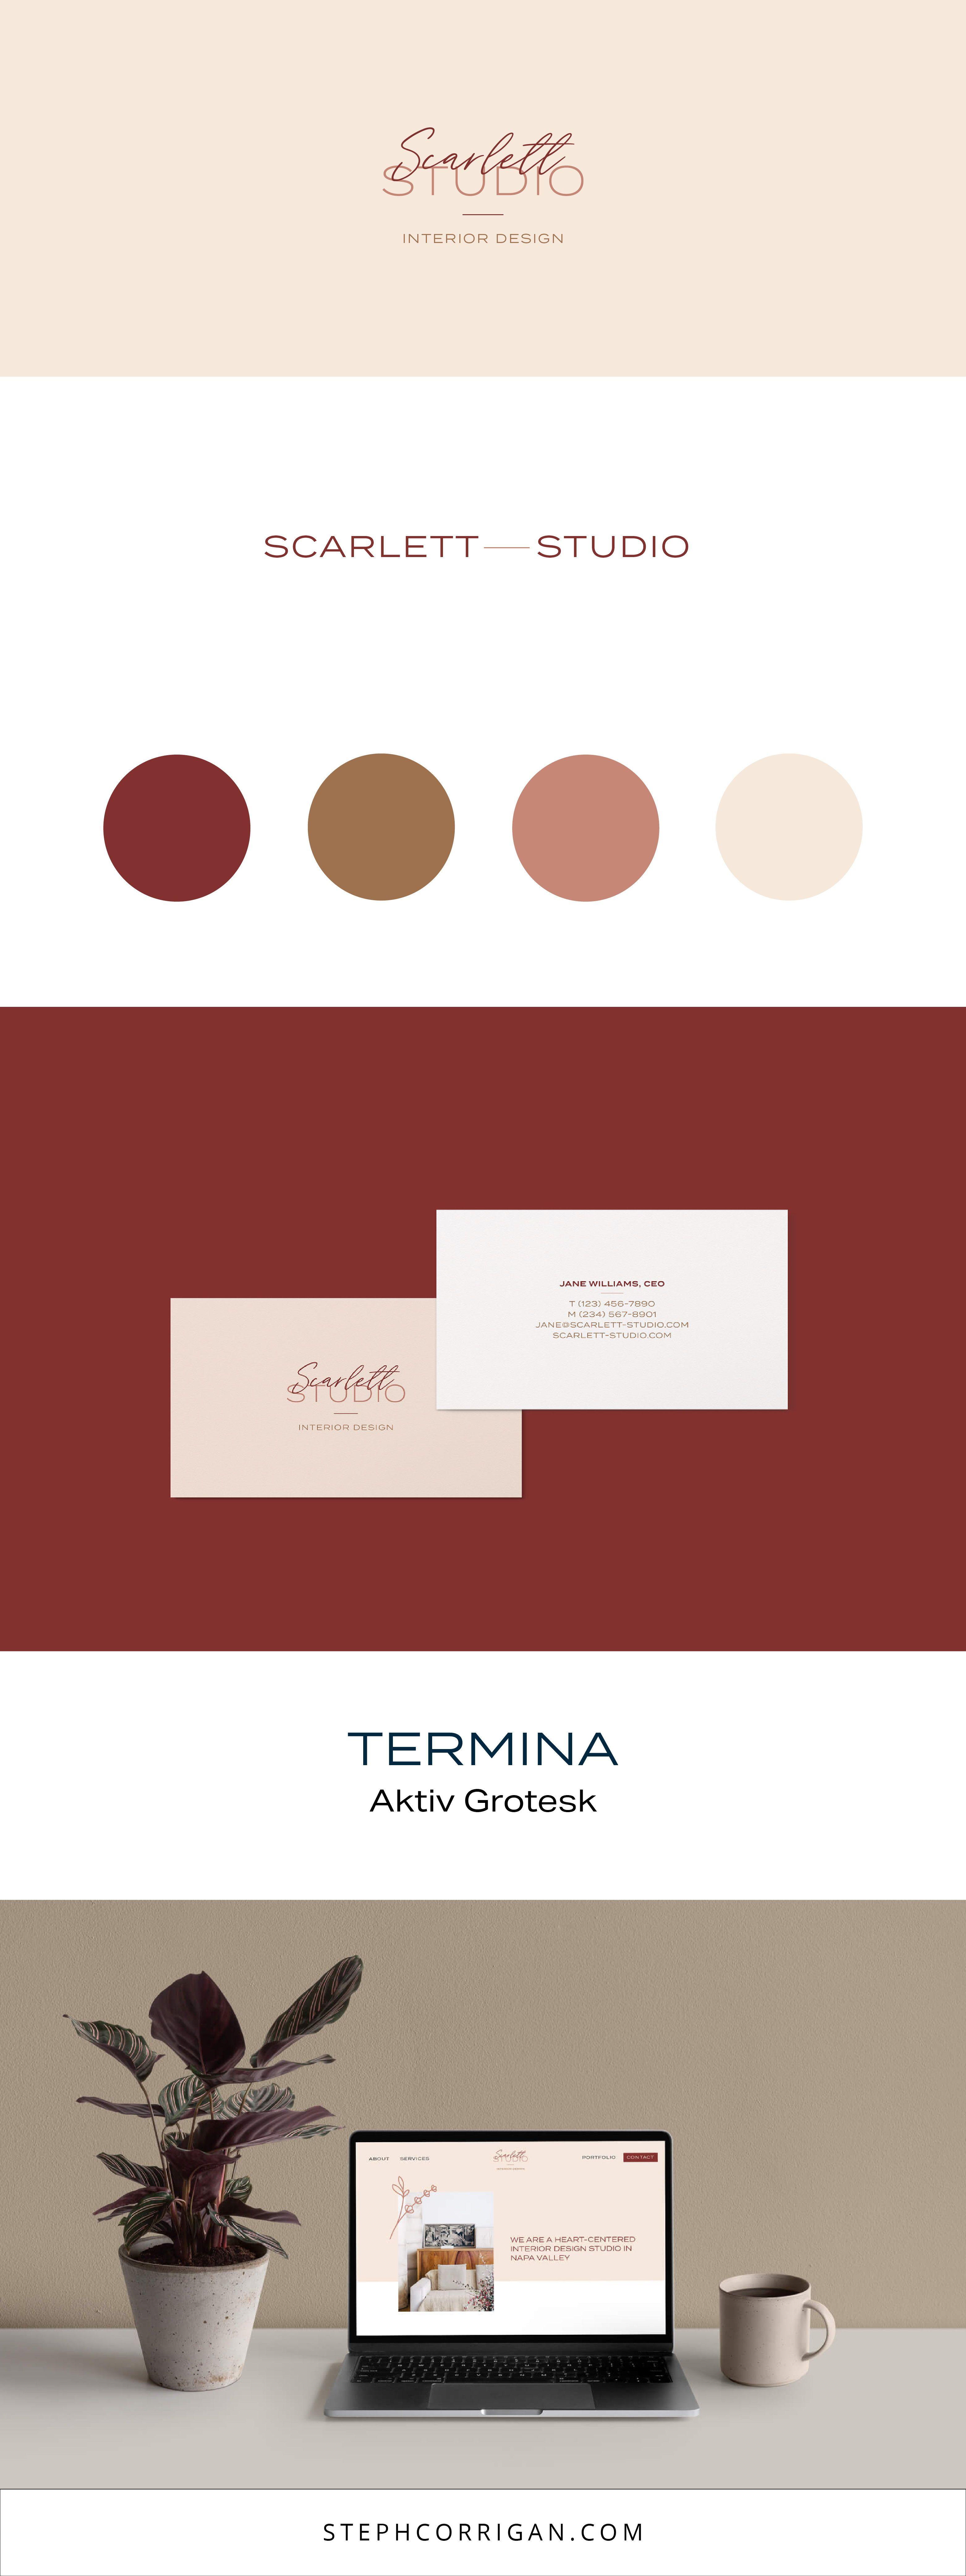 branding and interior design firms design